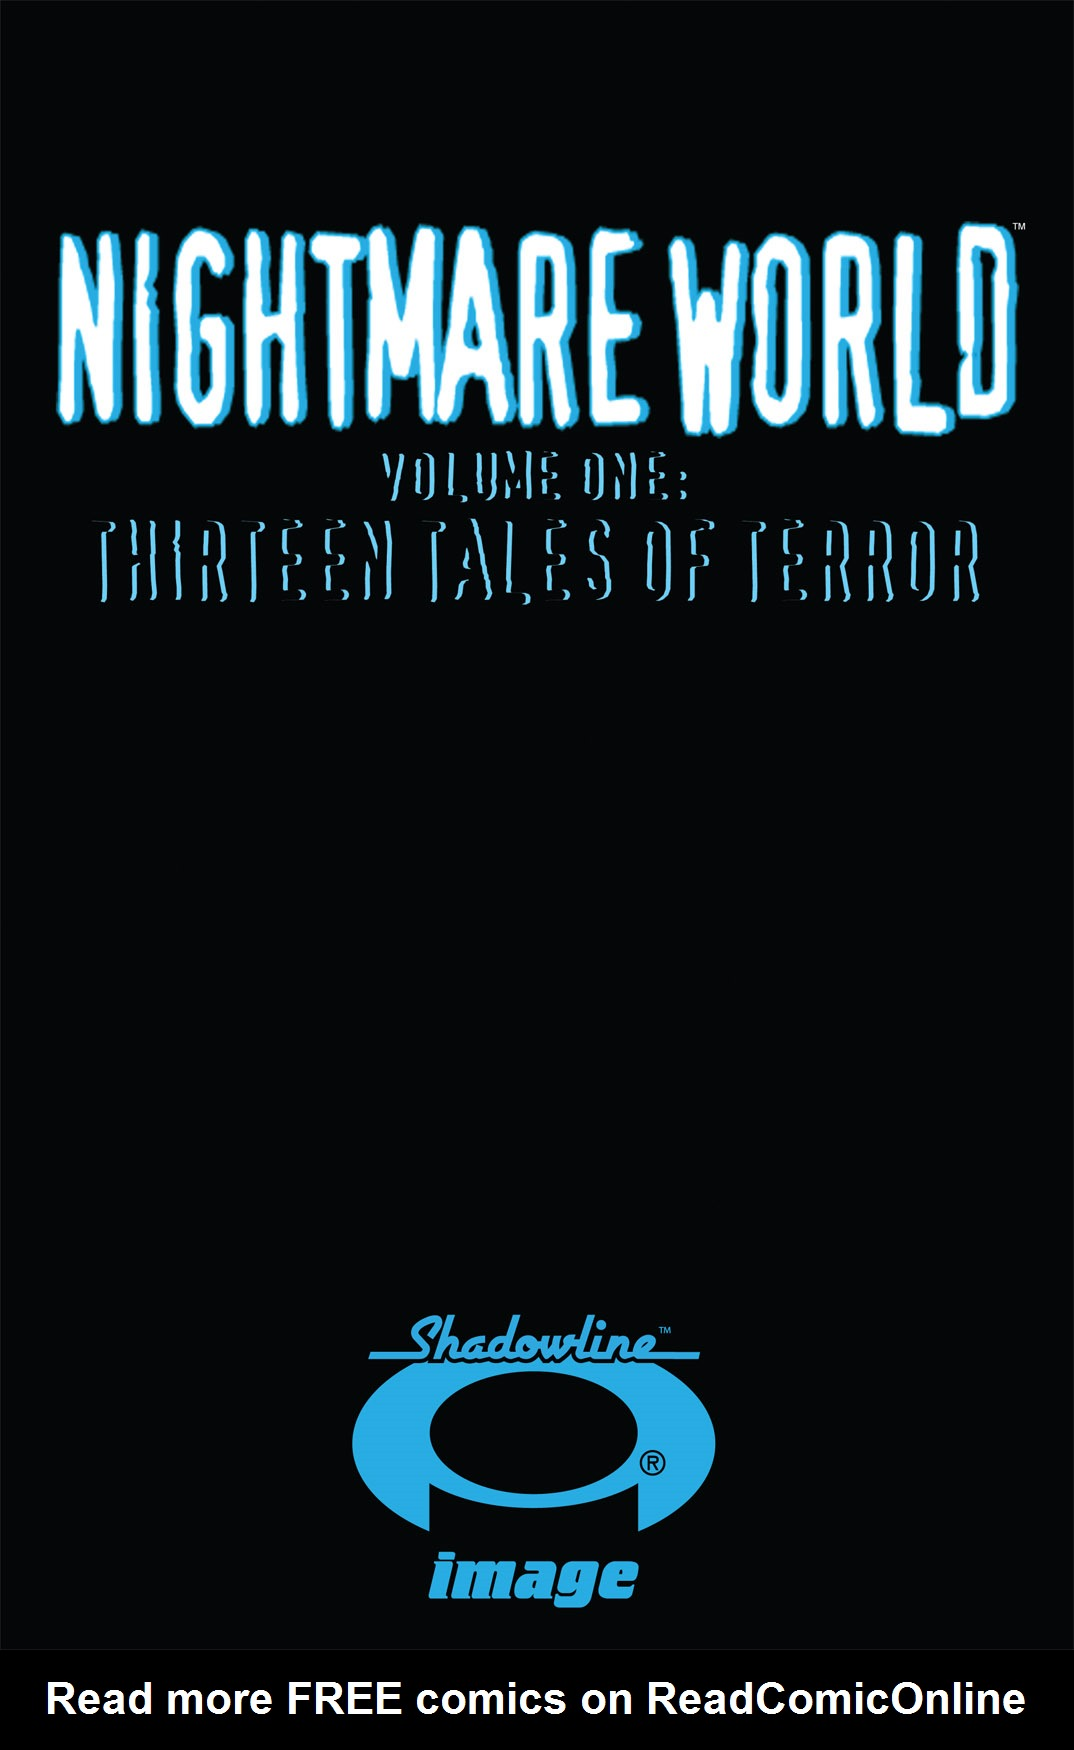 Read online Nightmare World comic -  Issue # Vol. 1 Thirteen Tales of Terror - 2